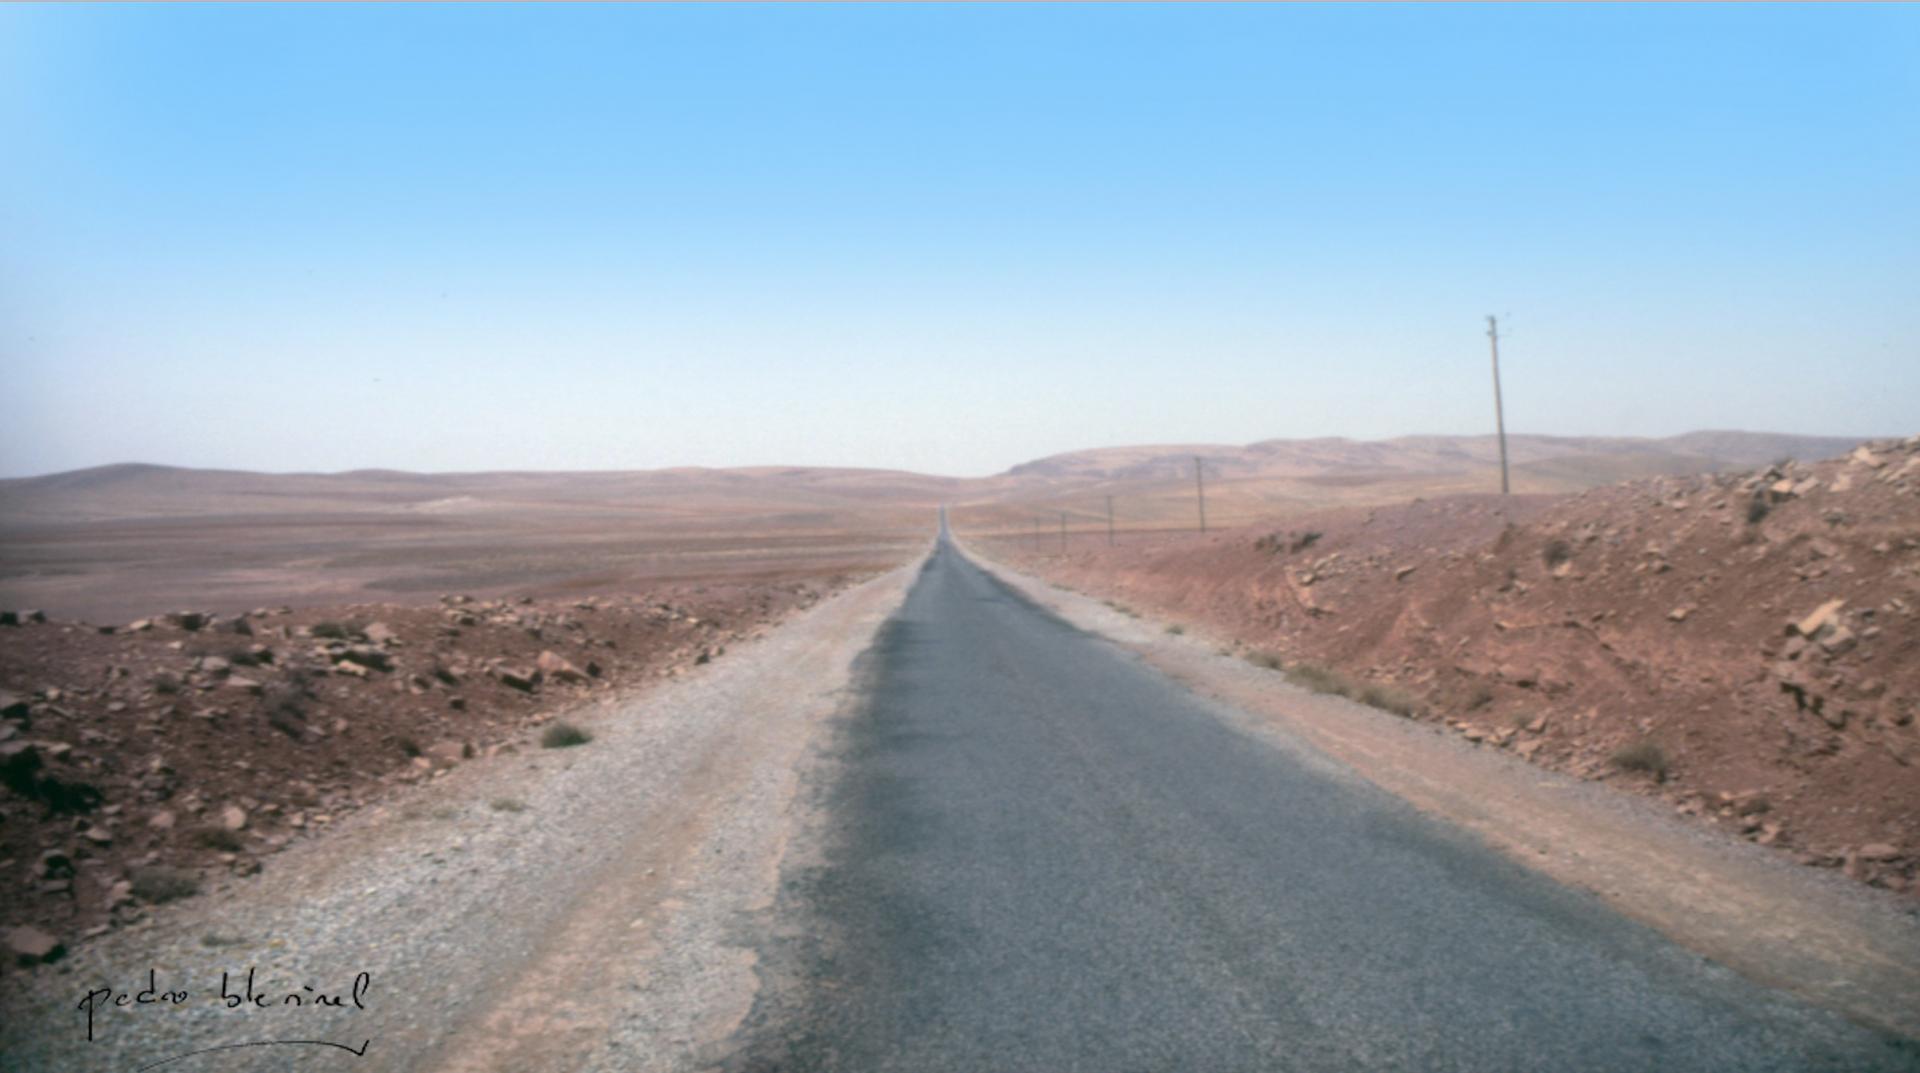 Vers le Sahara